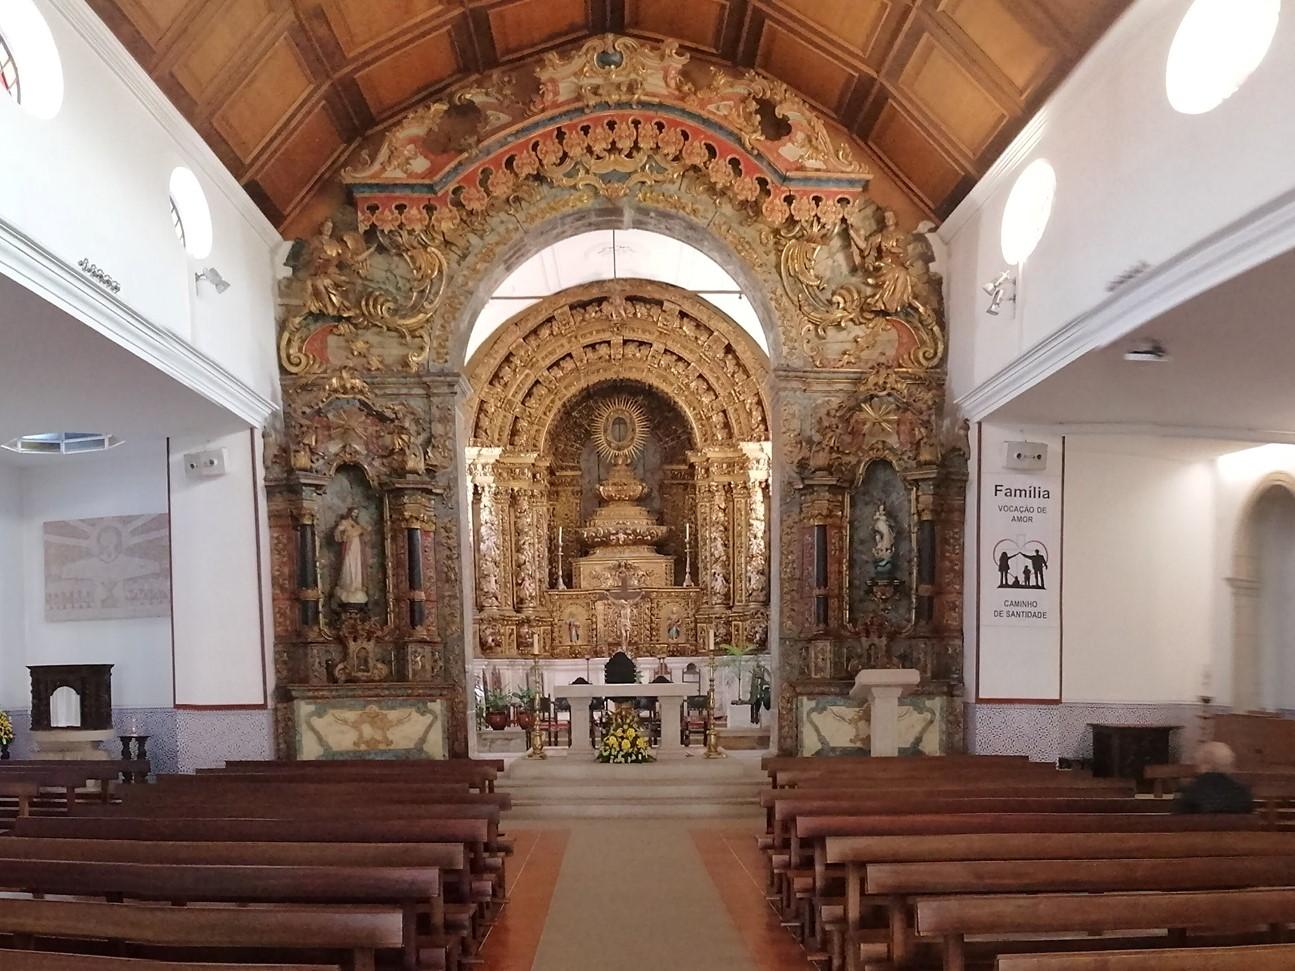 Igreja Paroquial de Albergaria-a-Velha